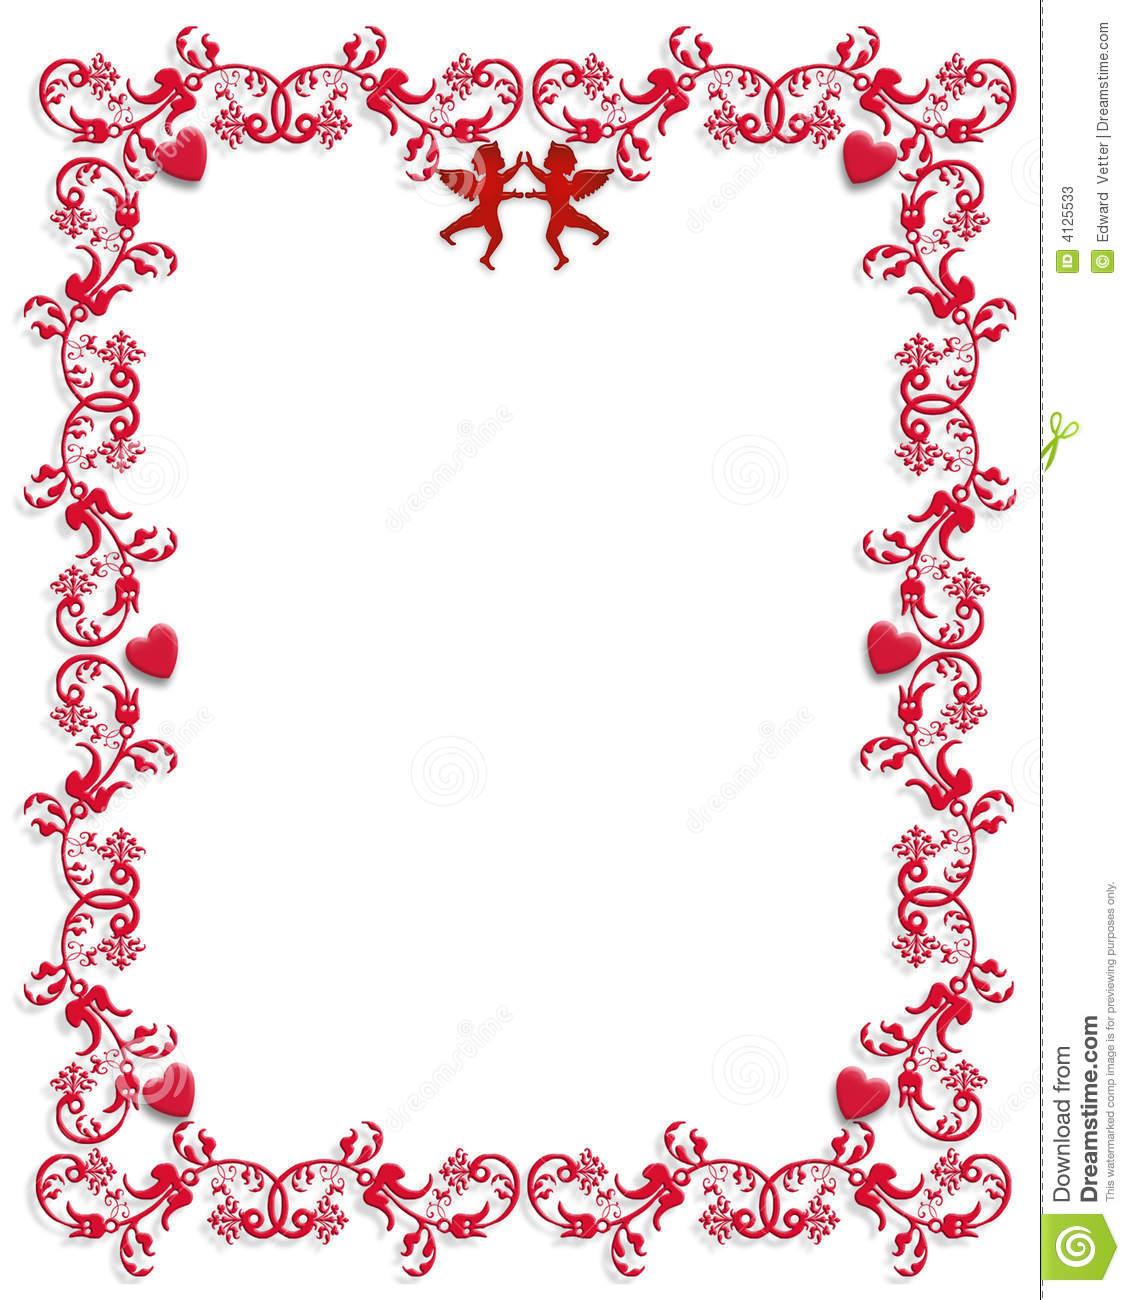 Jpeg school border clipart banner stock Valentine school border clipart - ClipartFest banner stock